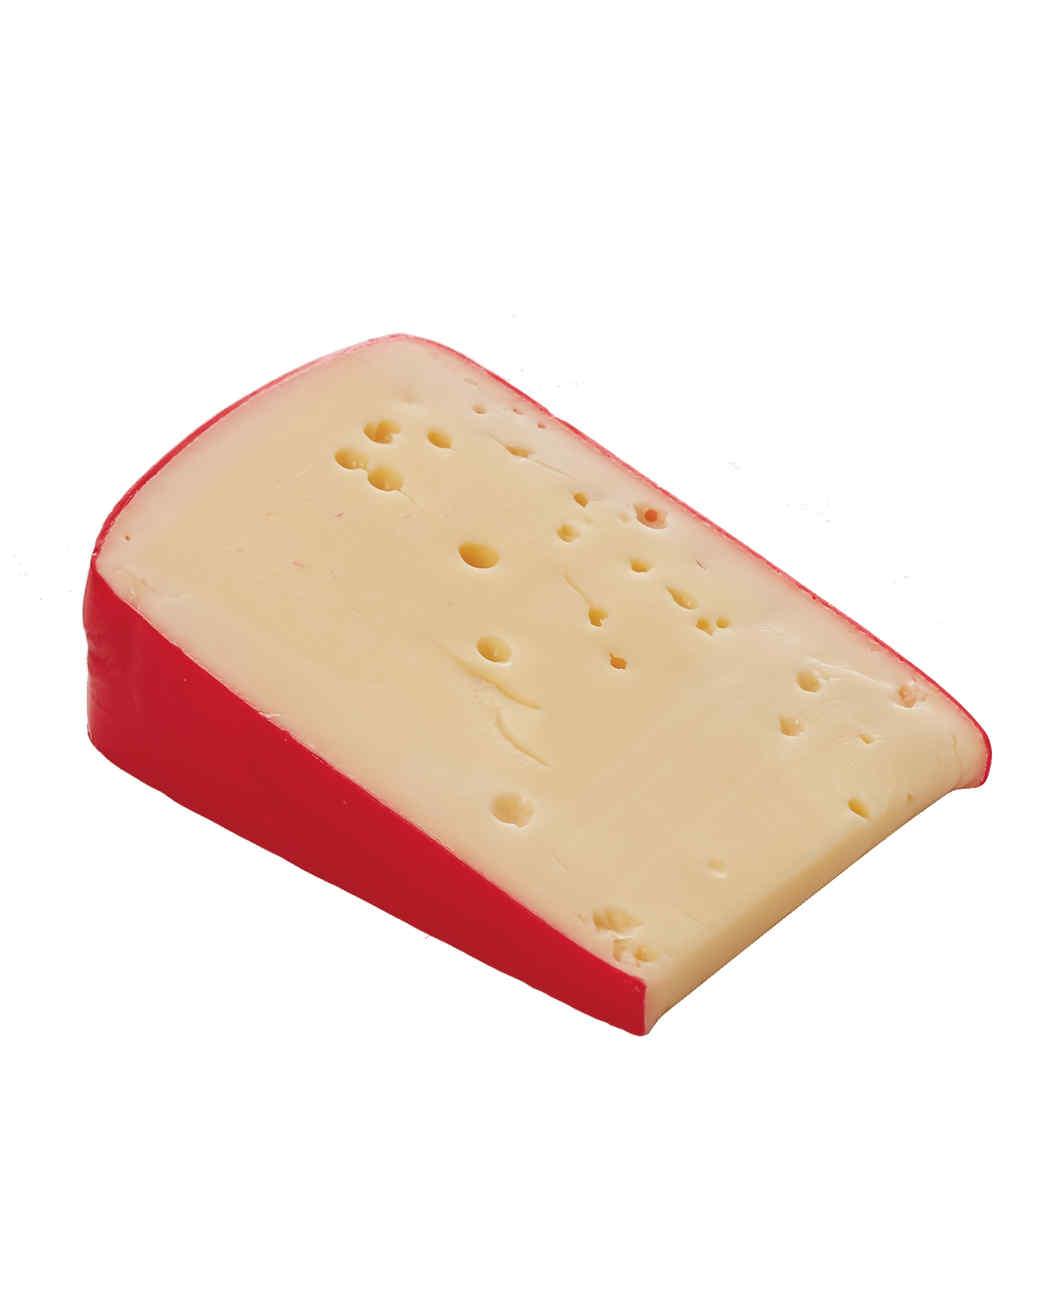 fontina-cheese-023-d111263.jpg